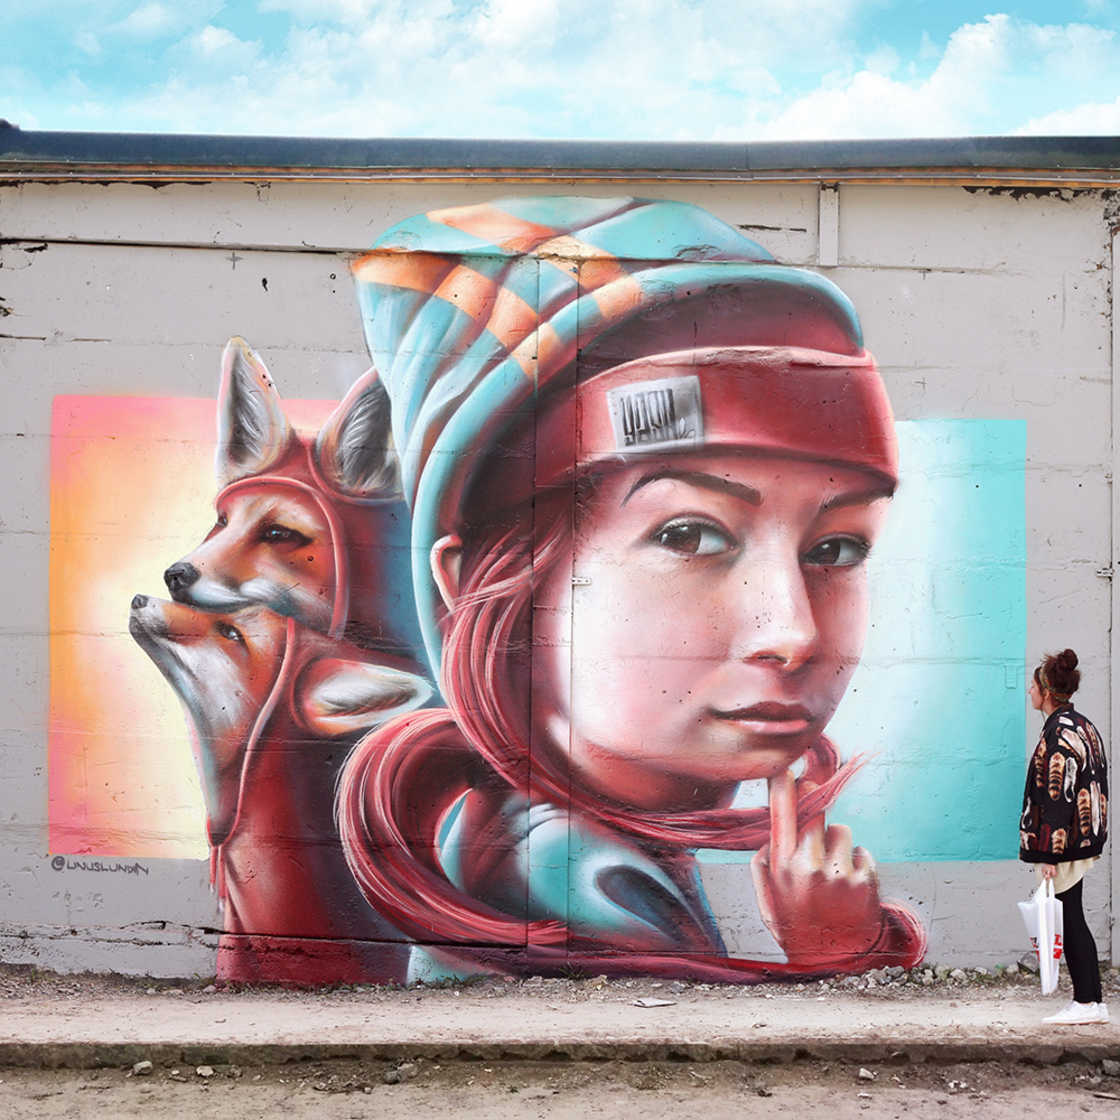 yash-one-street-art-3.jpg